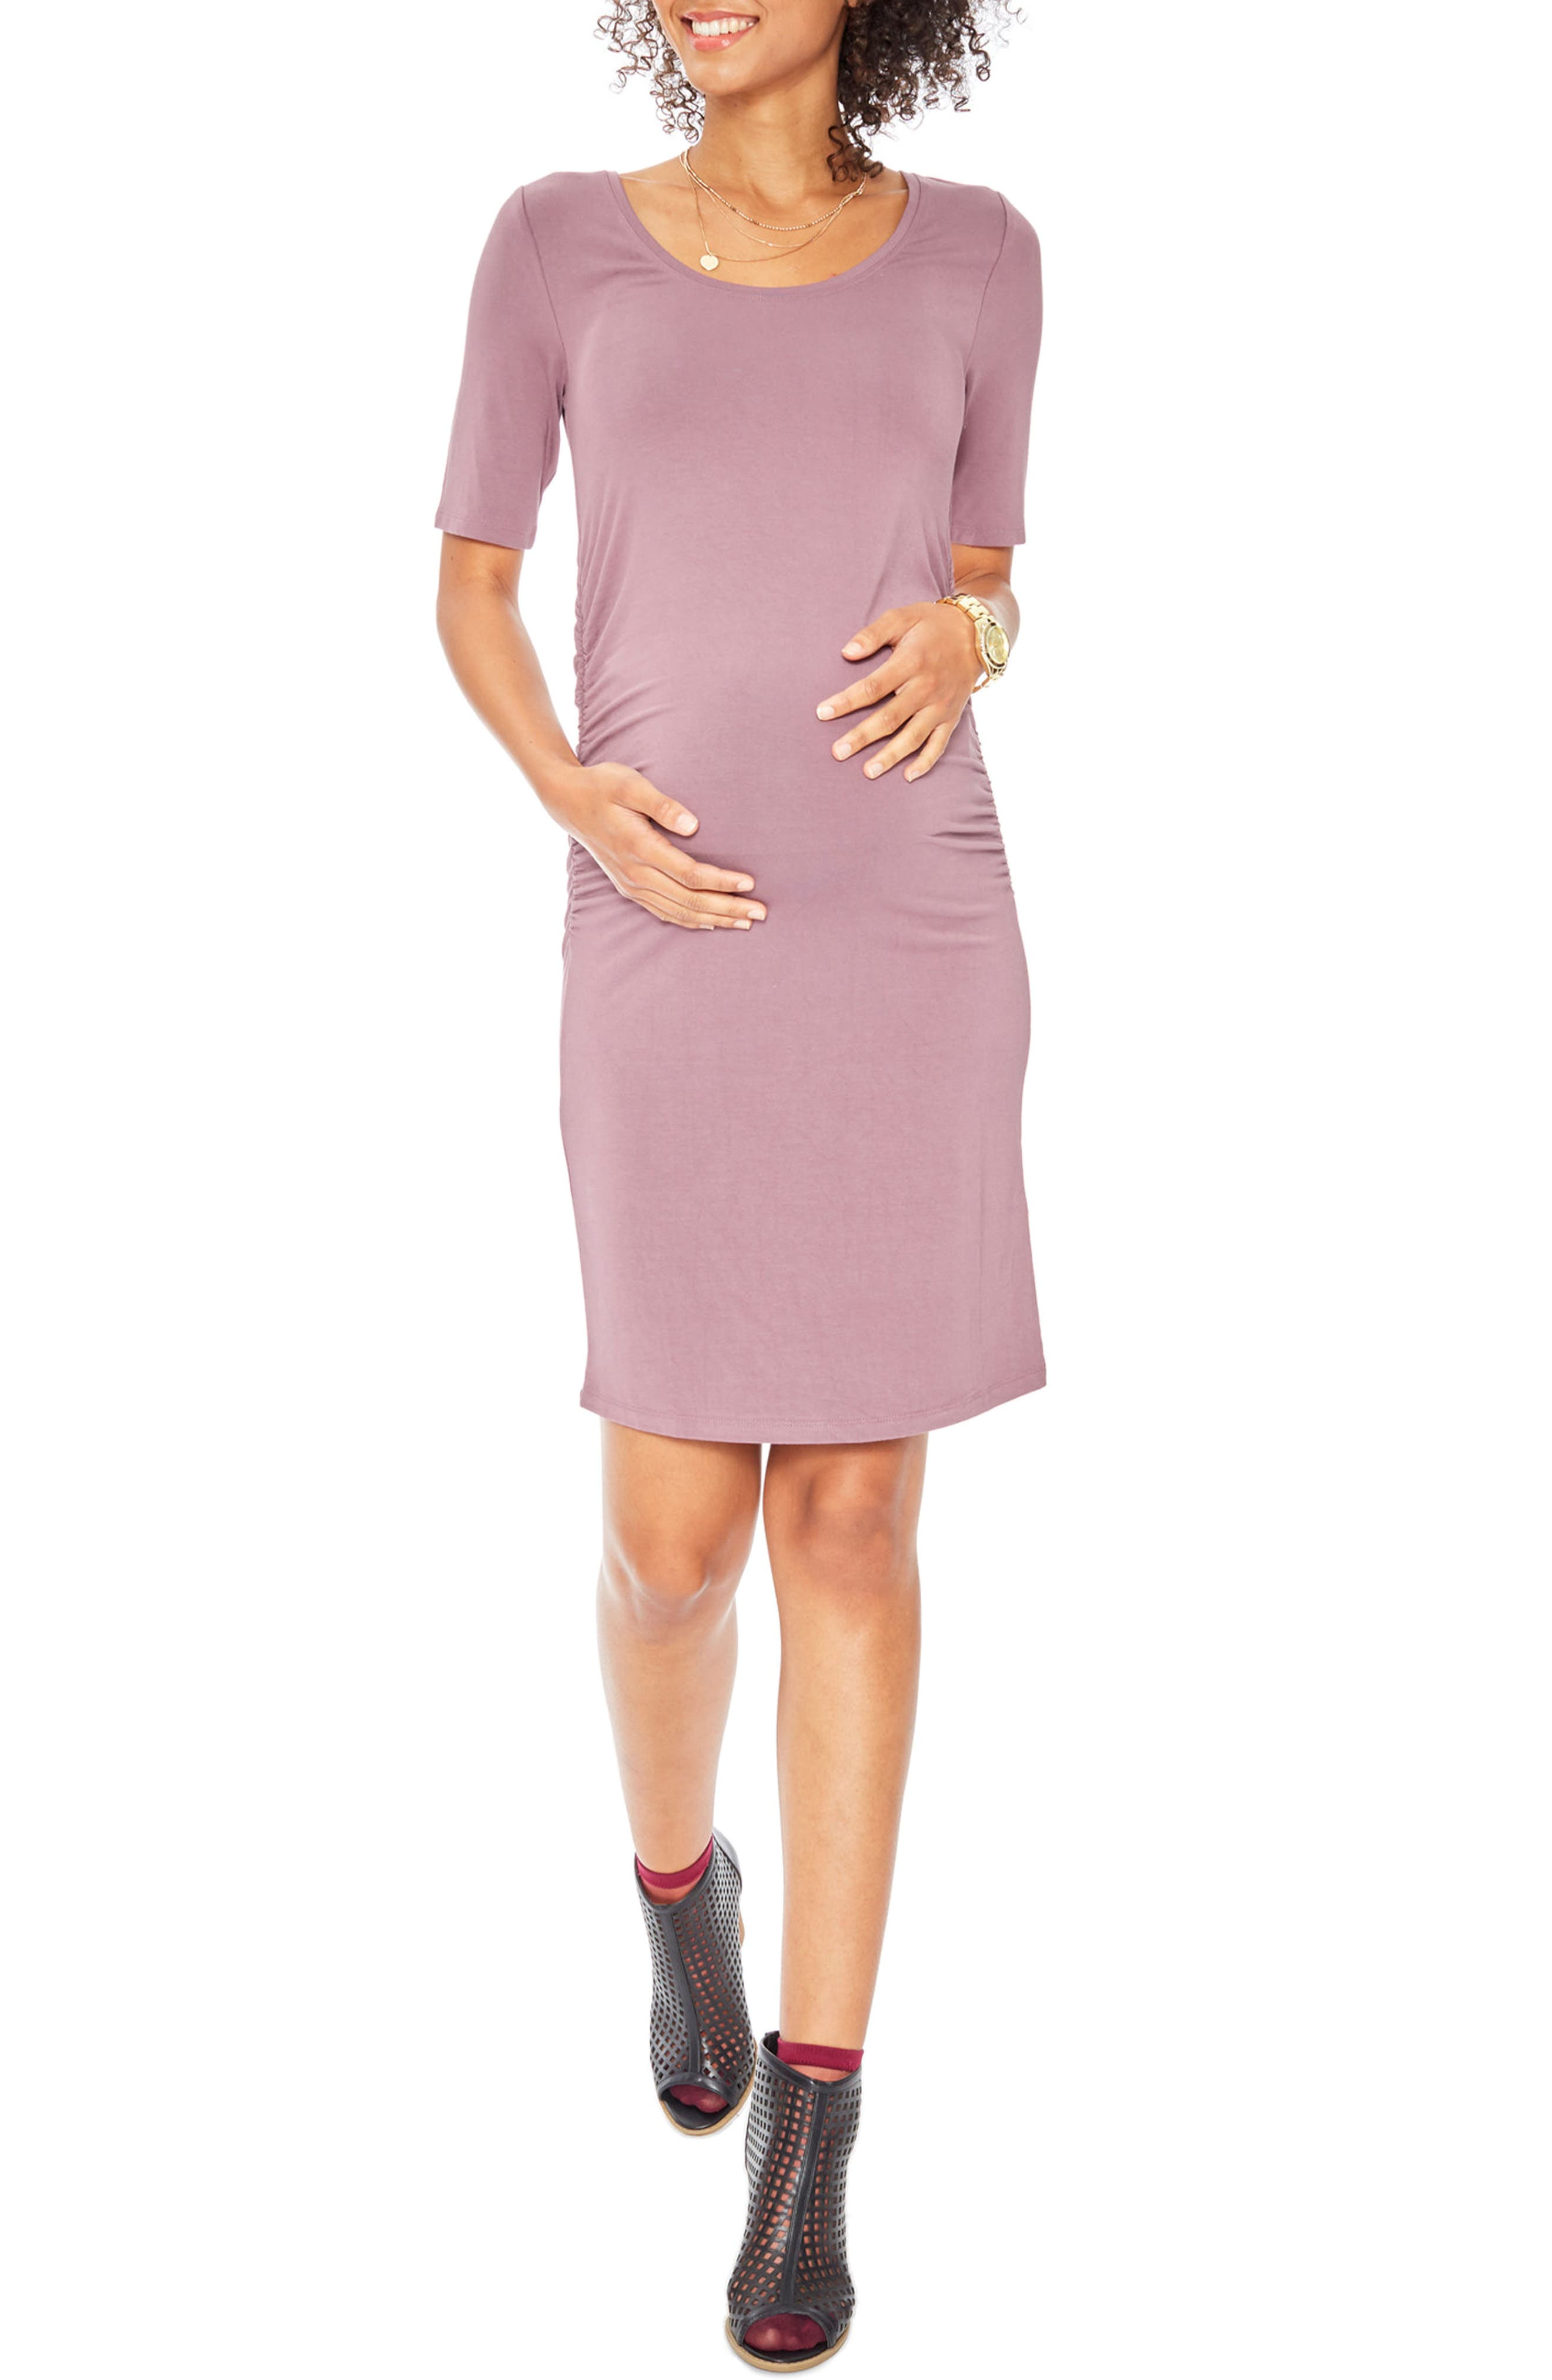 Rosie Pope RUTH MATERNITY DRESS